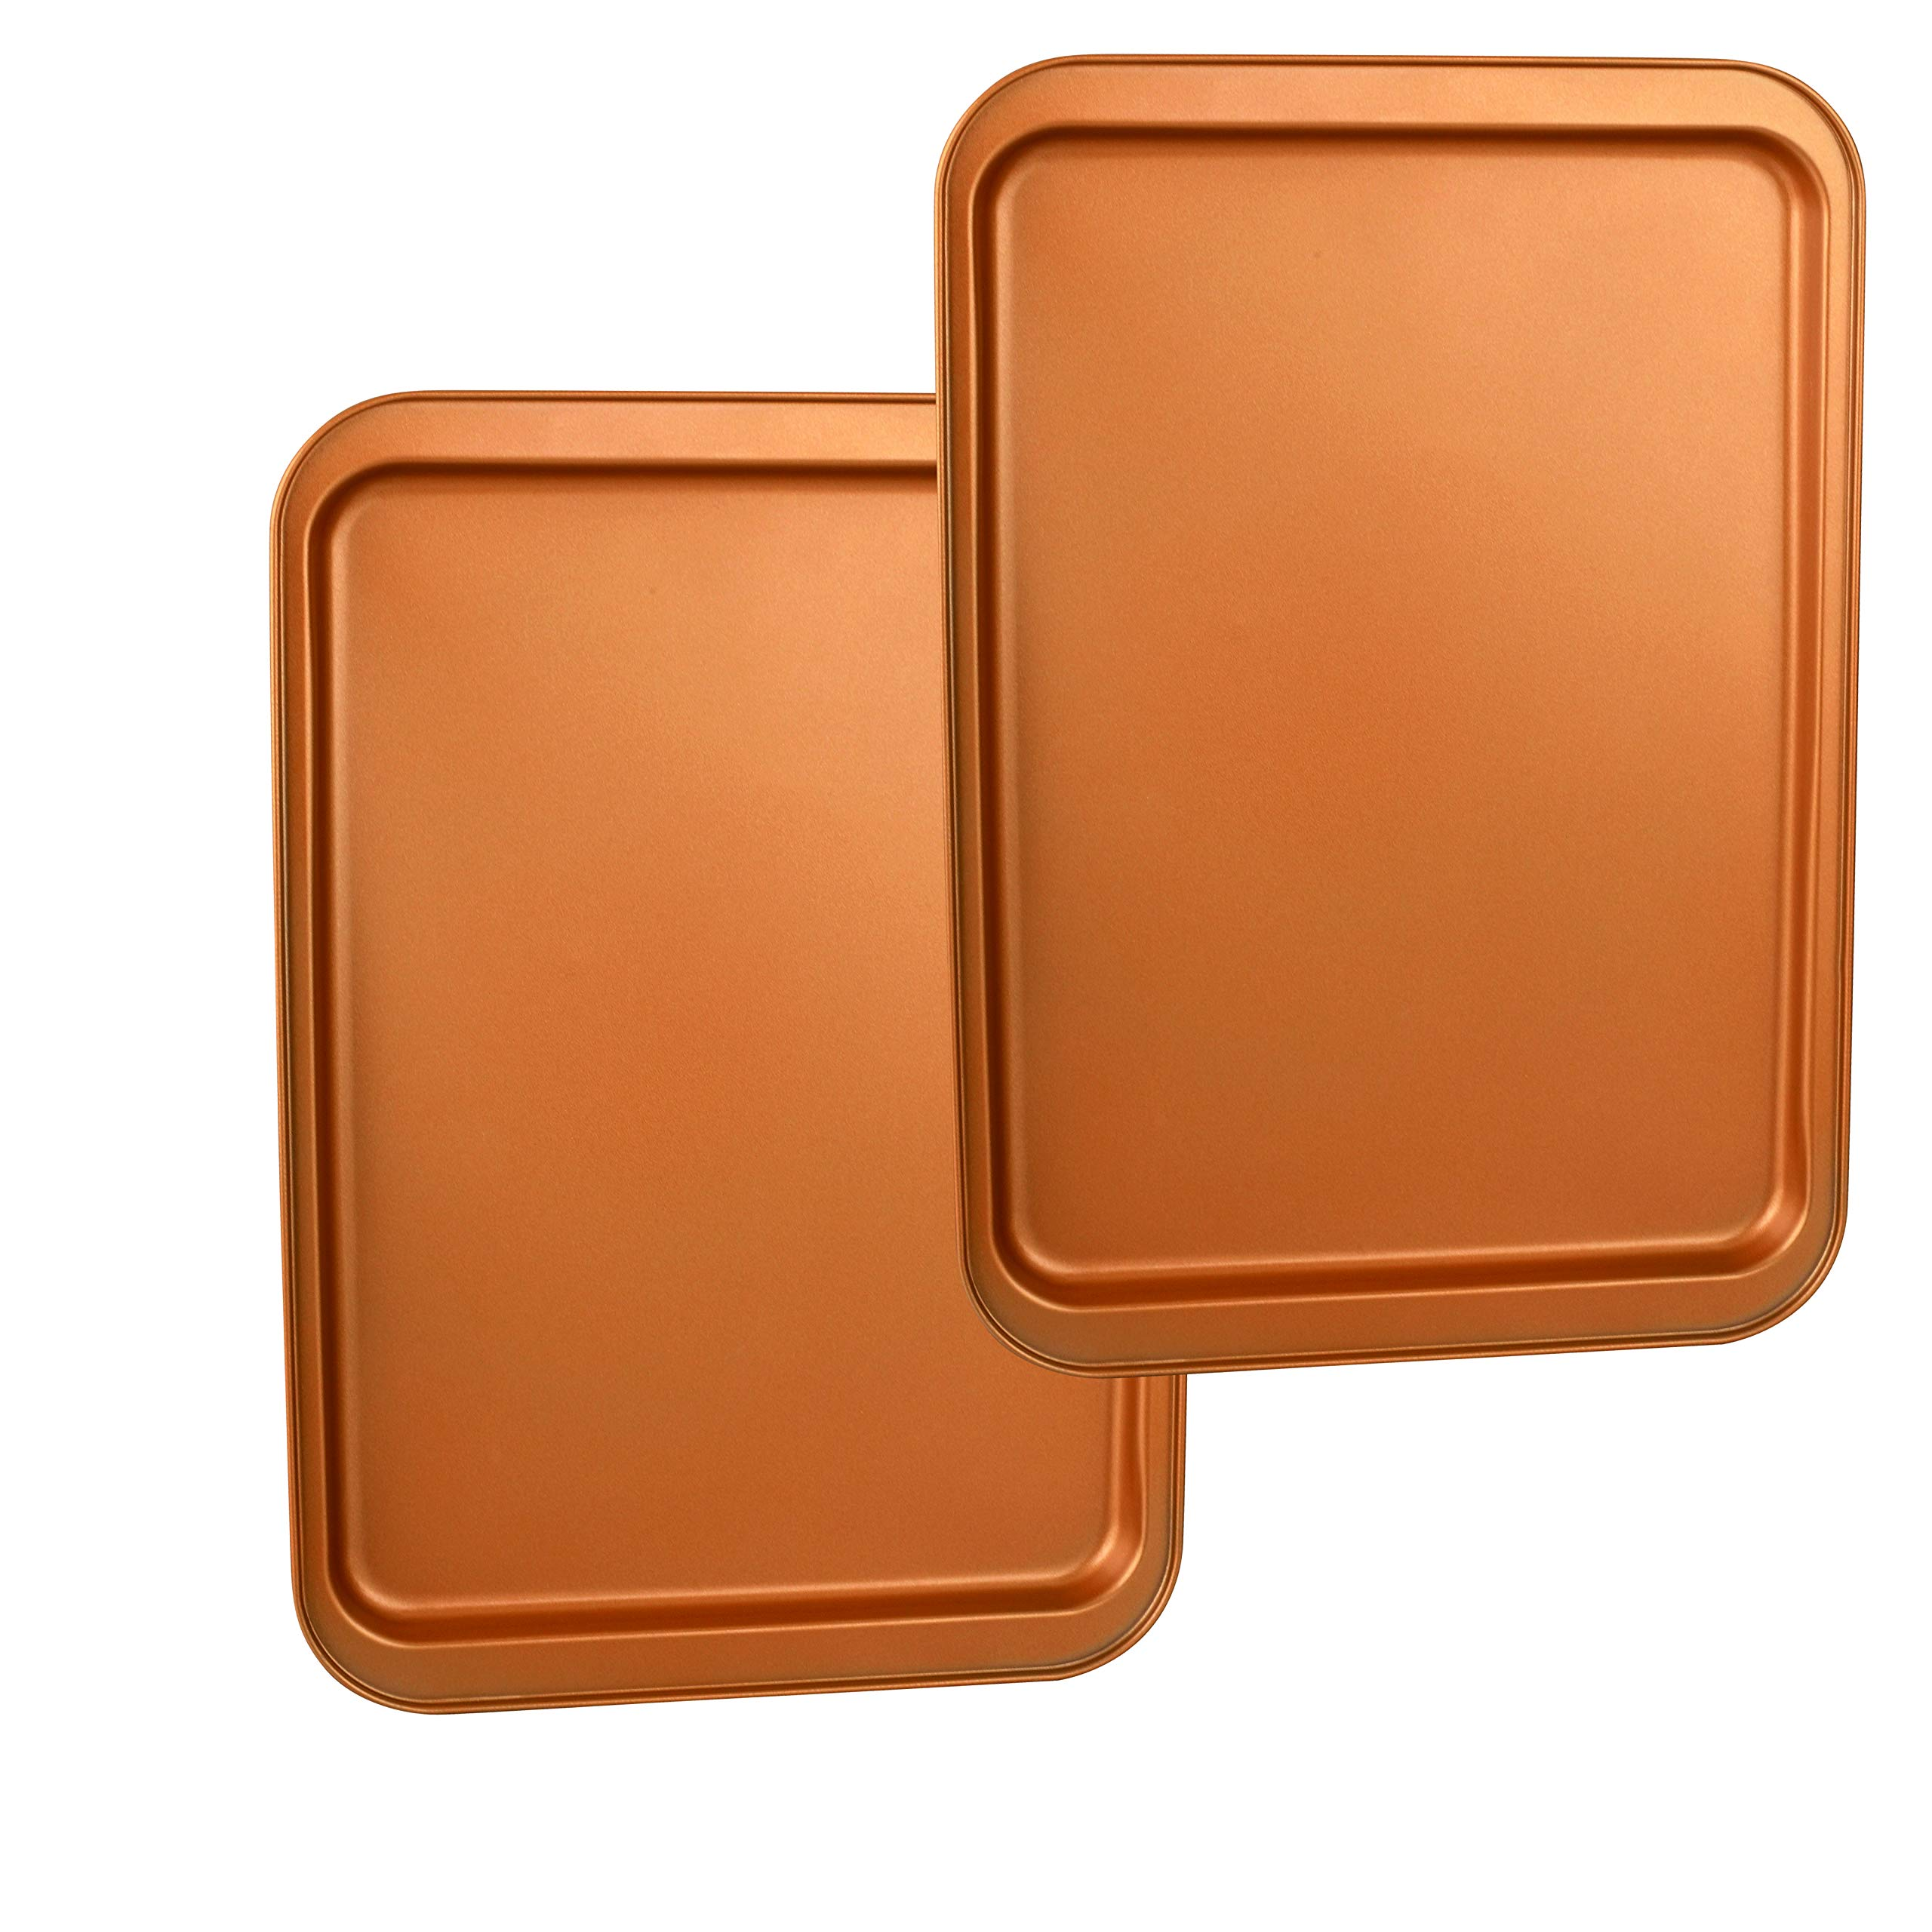 CopperKitchen Baking Pans - 3 pcs Toxic Free NONSTICK - Organic Environmental Friendly Premium Coating - Durable Quality - Rectangle Pan, Cookie Sheet - BAKEWARE SET (3) by CopperKitchenUSA (Image #7)